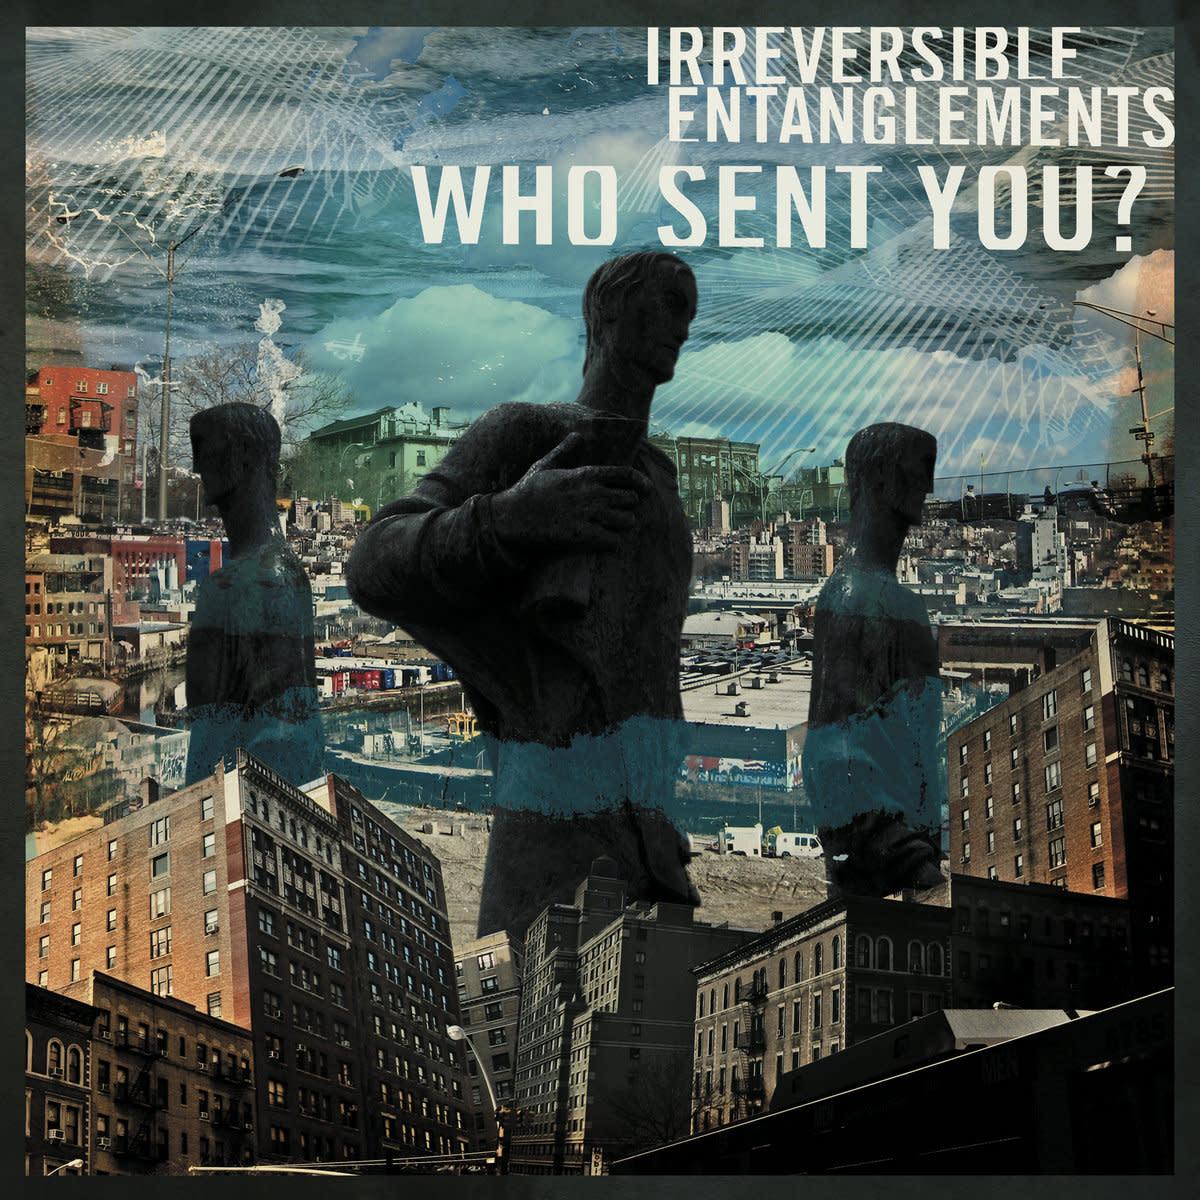 Irreversible Entanglements • Who Sent You?-1